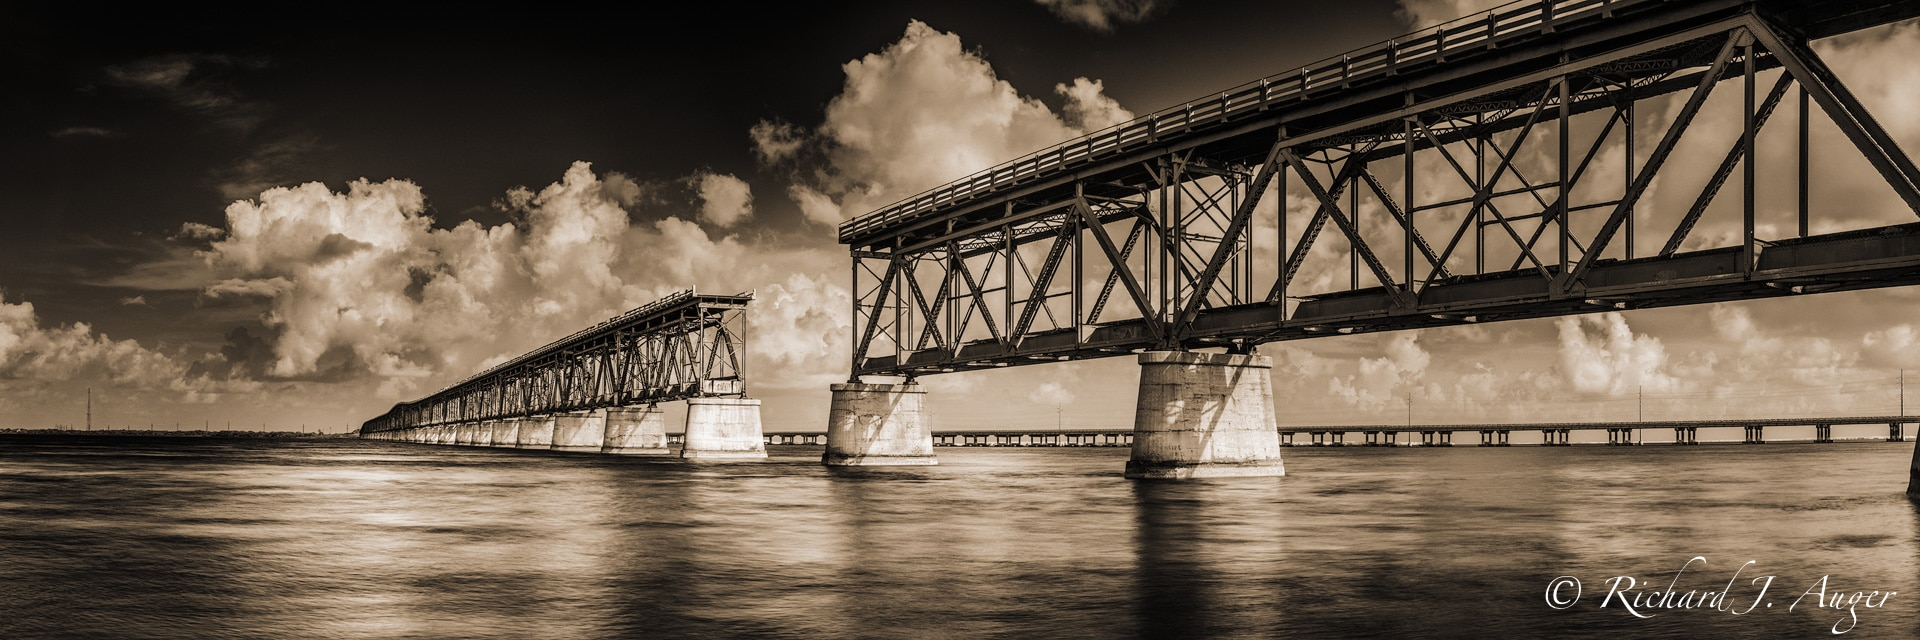 Bahia Honda Bridge, Bahia Honda State Park, Florida Keys, Historic, Water, Ocean, Sepia, Monochrome, Landscape, photographer, photograph